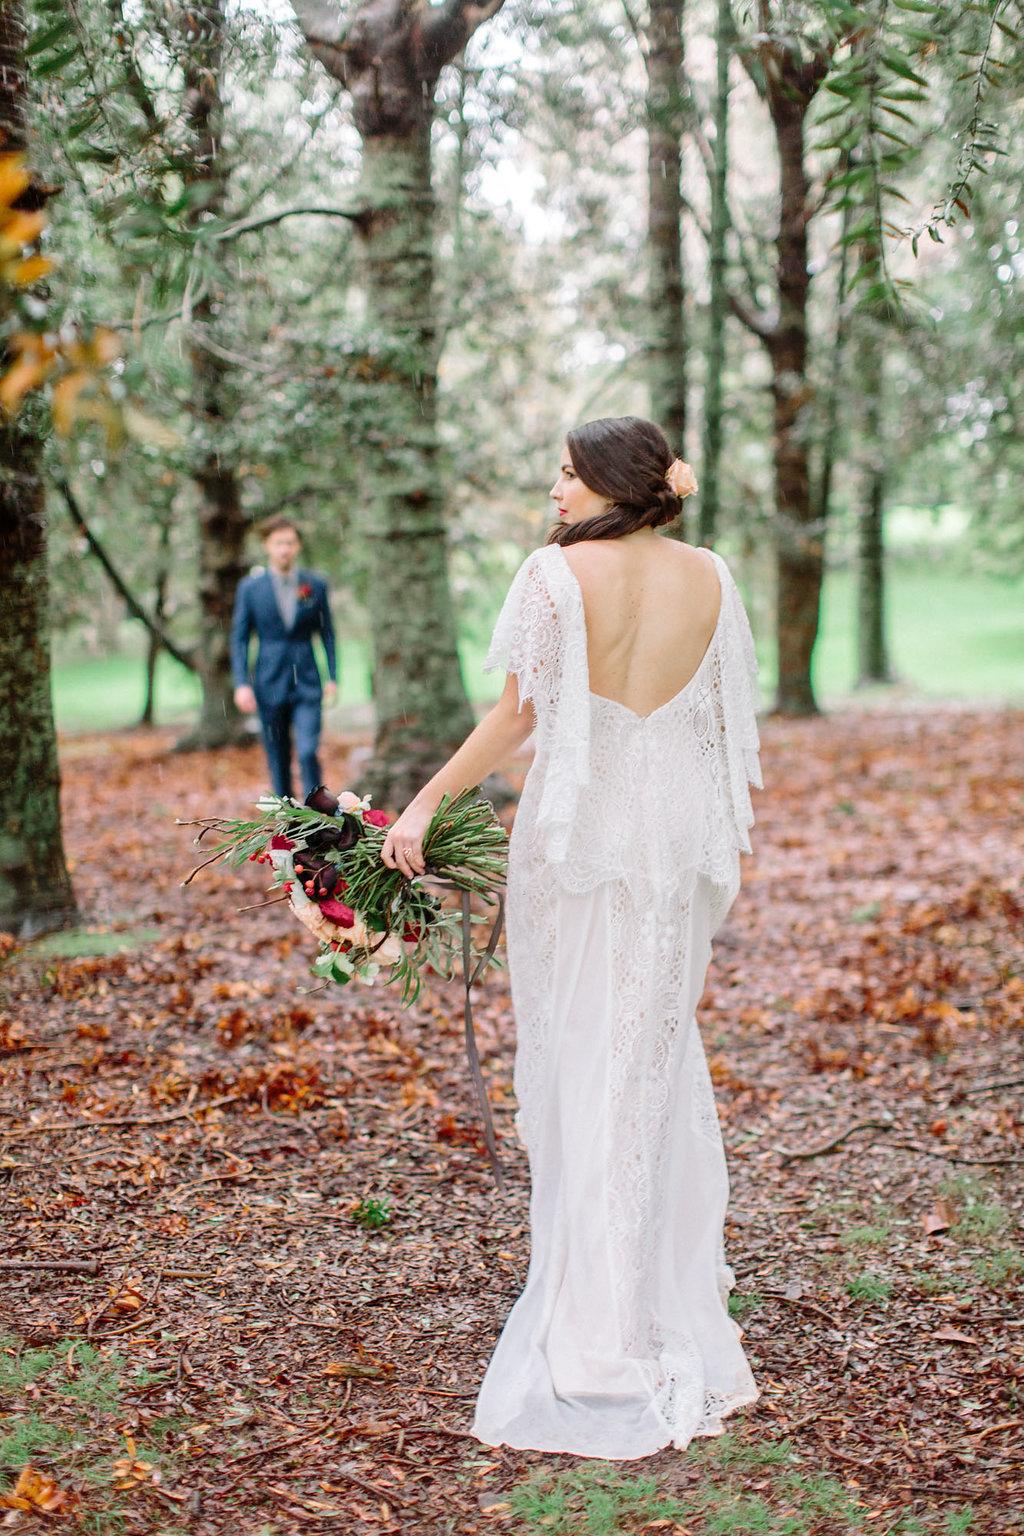 elizabeth may bridal littleredlow-66.jpg